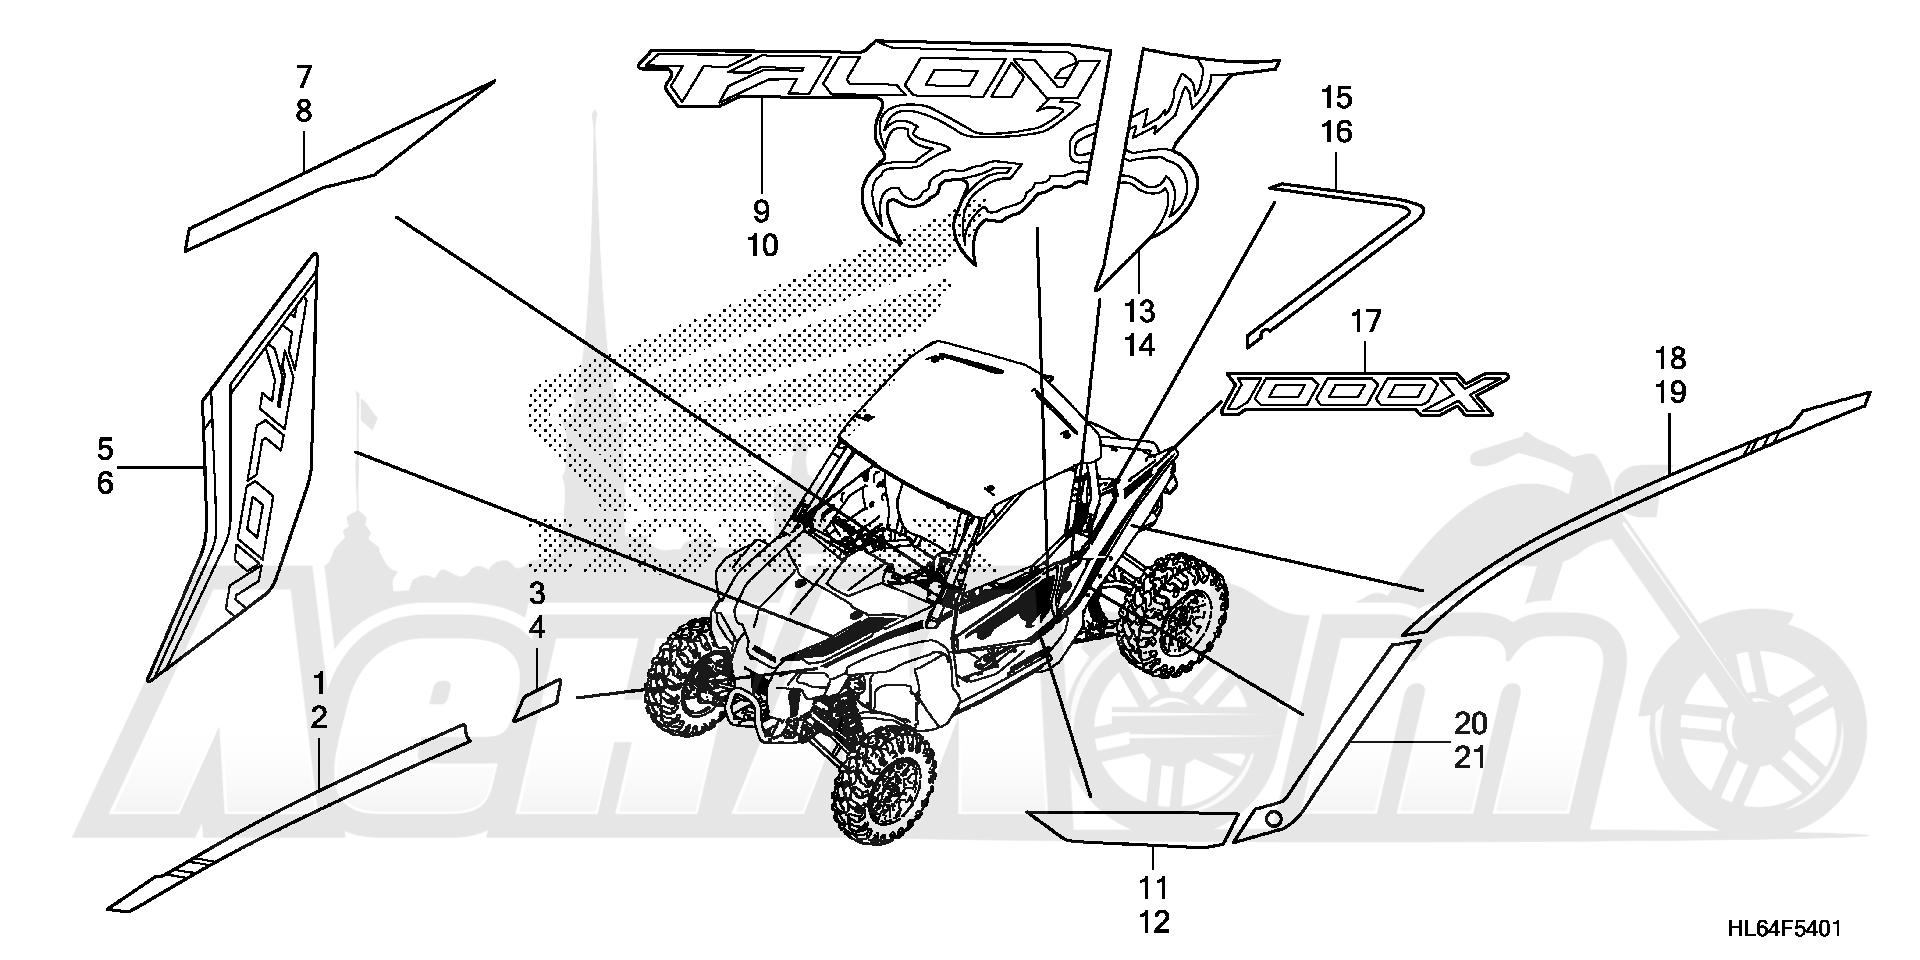 Запчасти для Квадроцикла Honda 2019 SXS1000S2R Раздел: MARK (2) | знак (2)